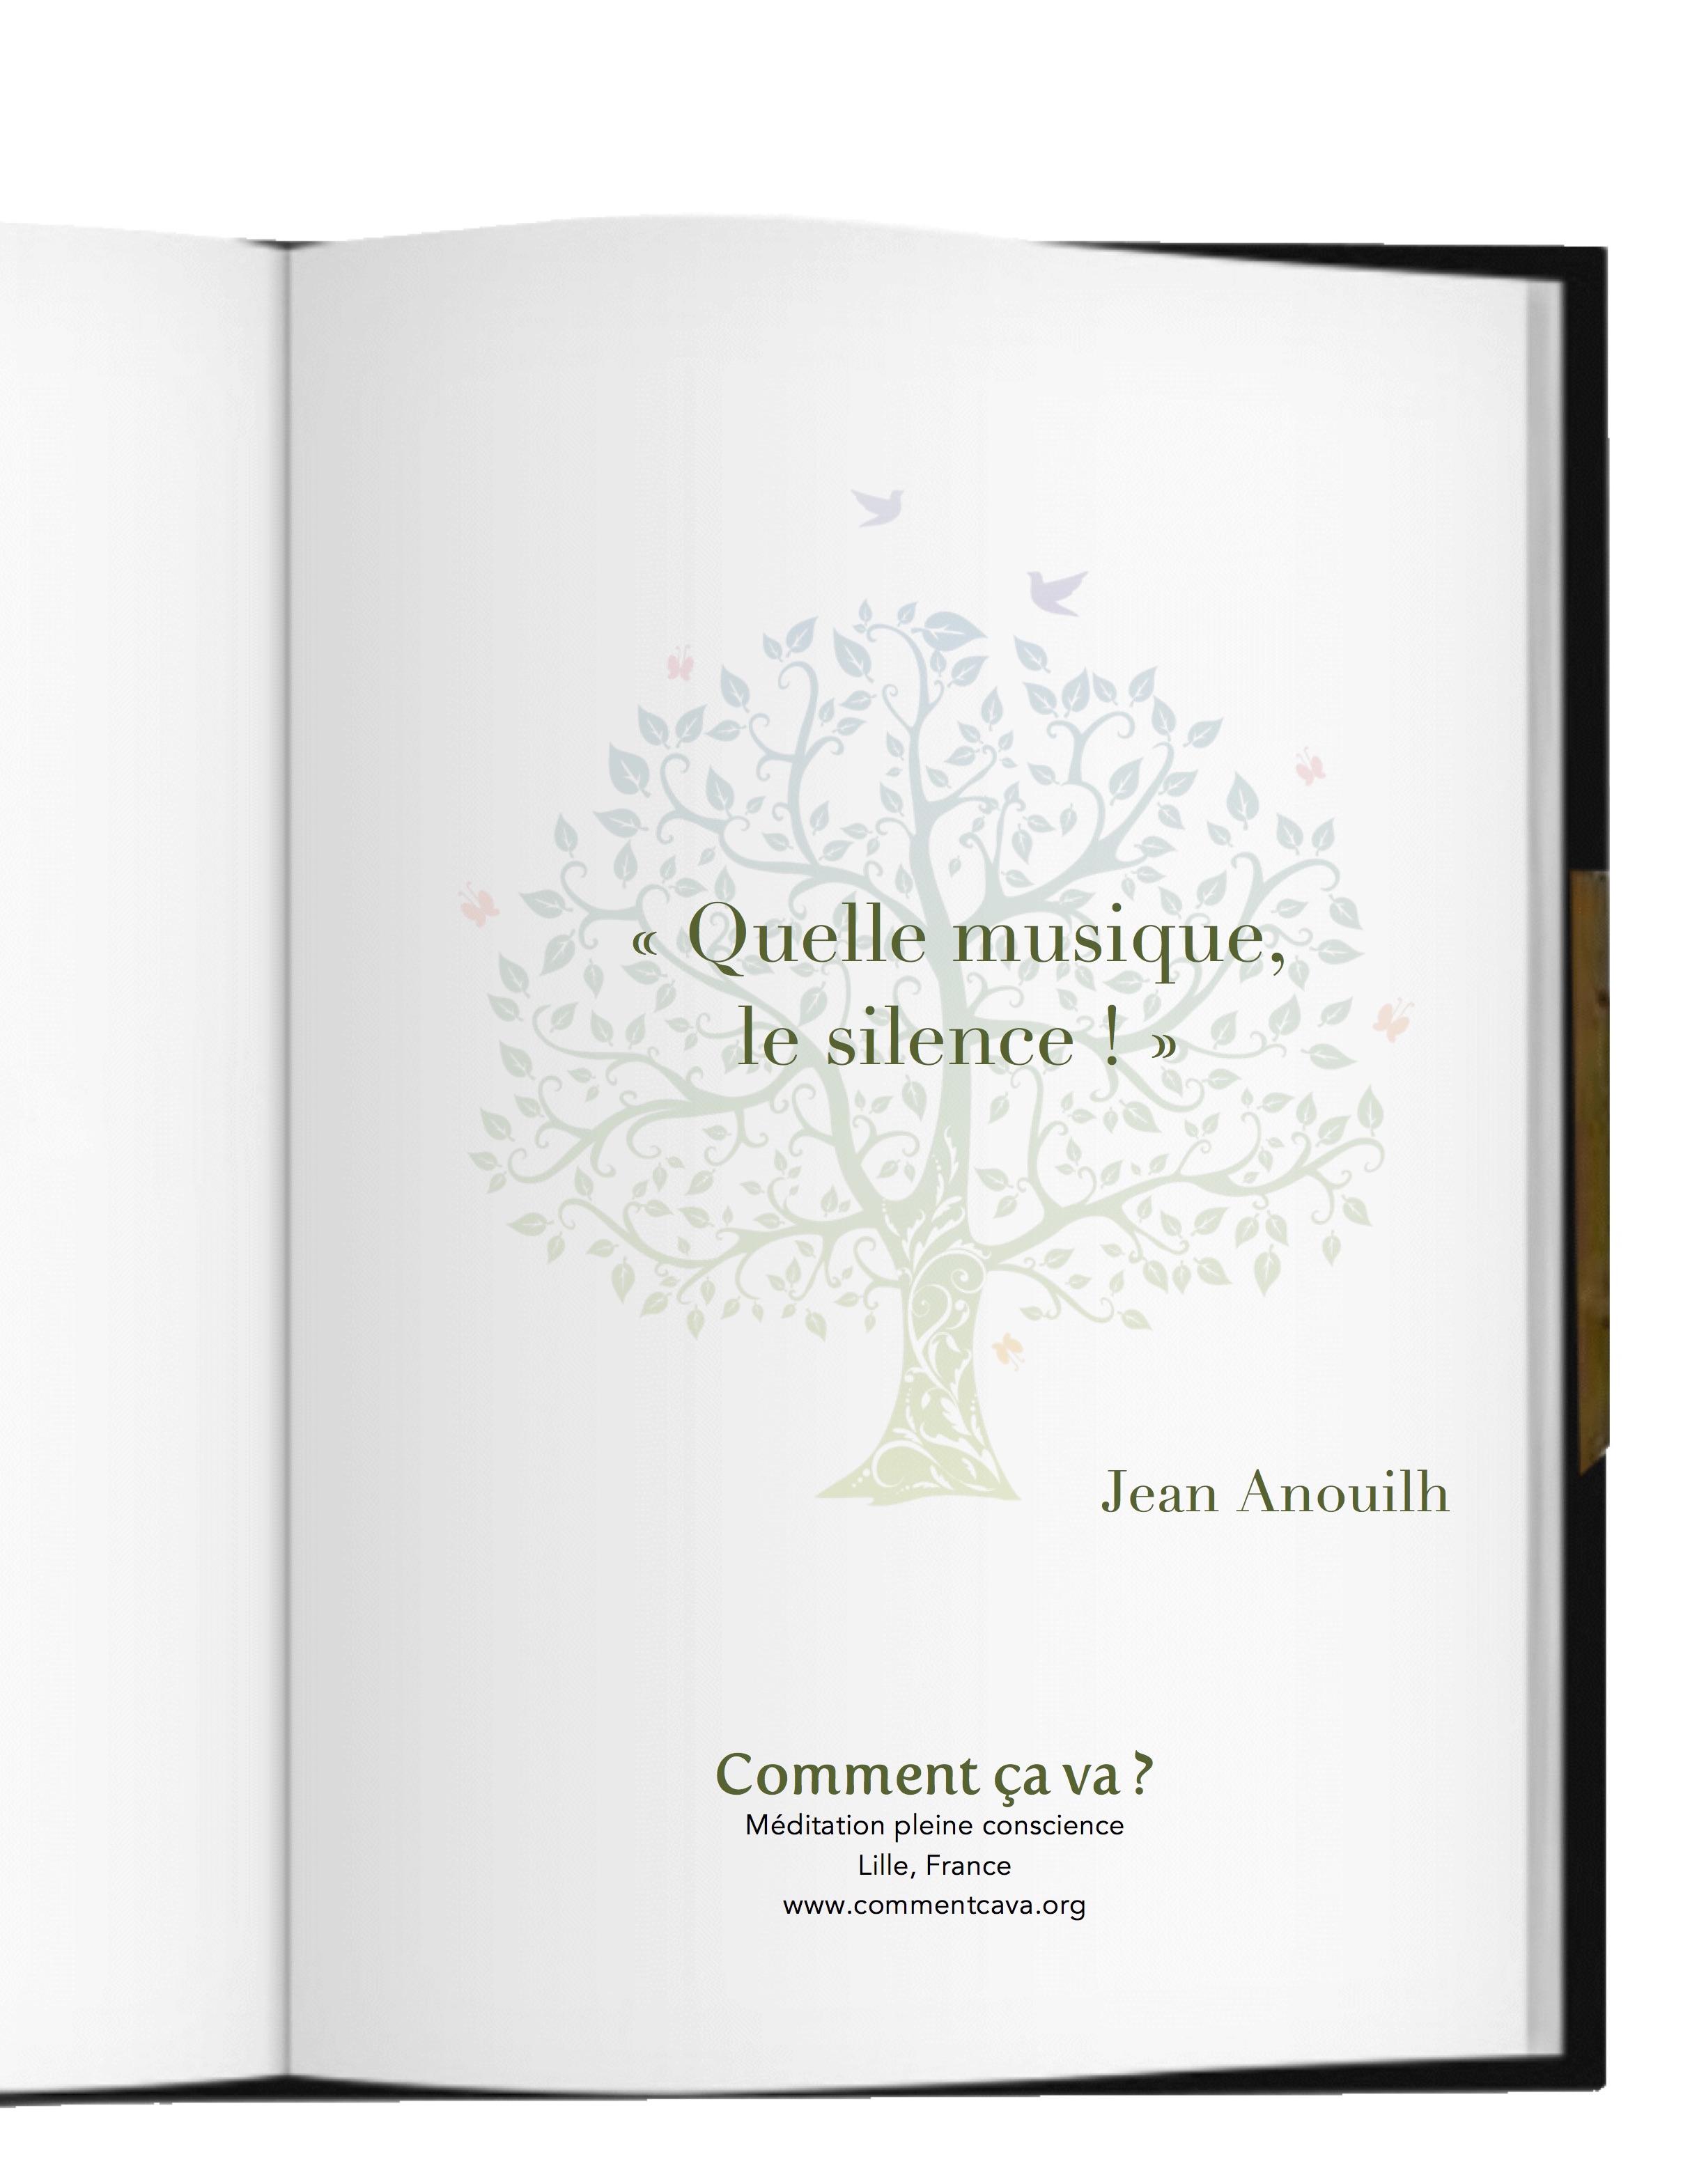 Dissertation citation jean anouilh